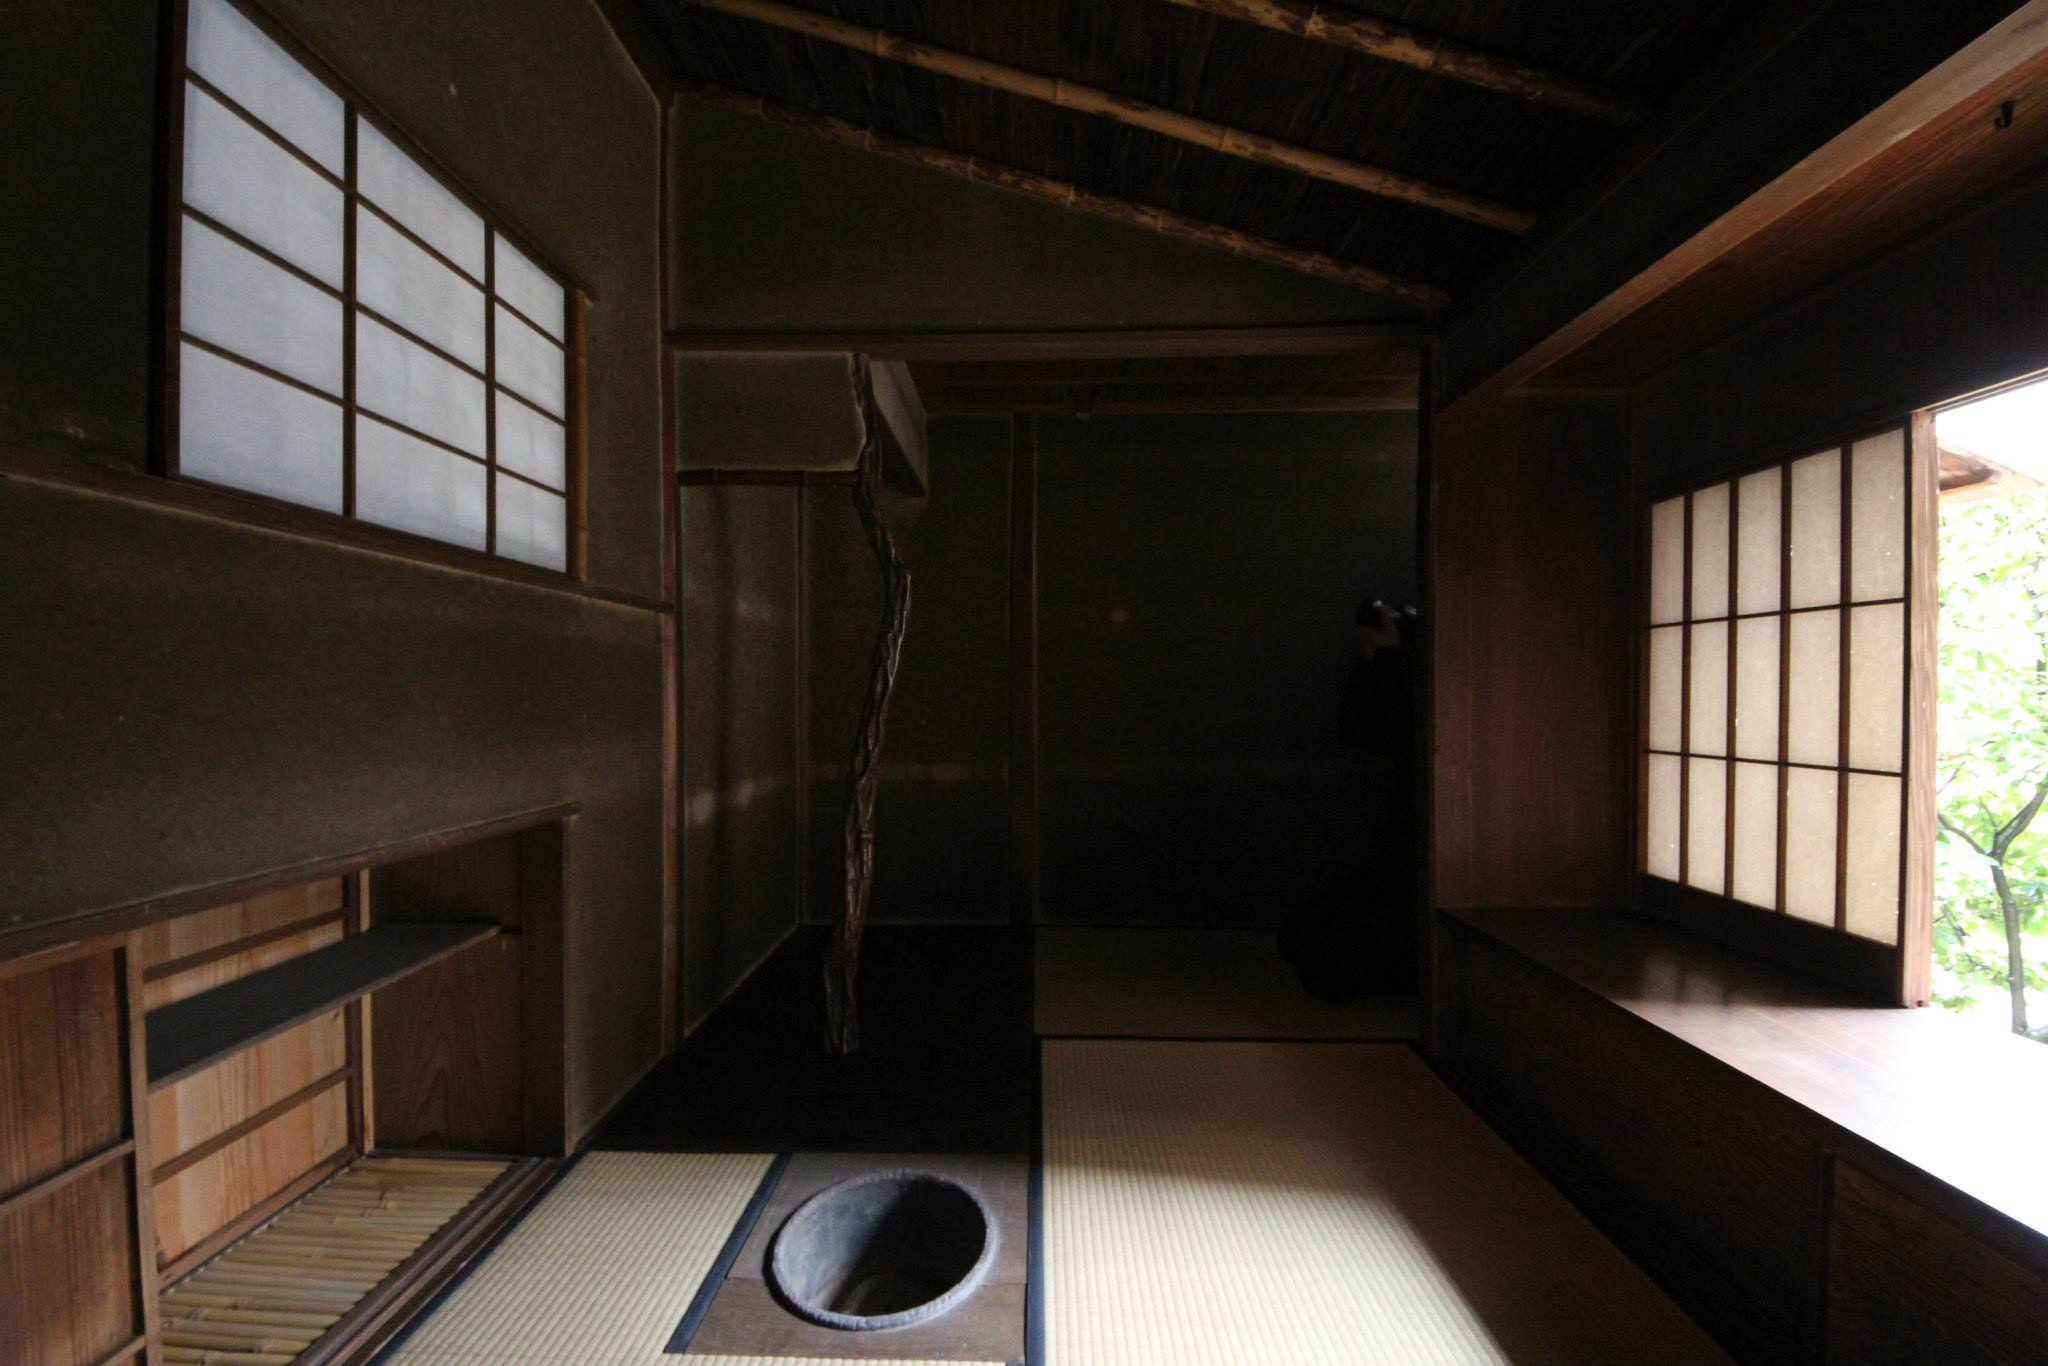 金沢 雨とお茶室│北陸建築旅_b0274159_14152655.jpg